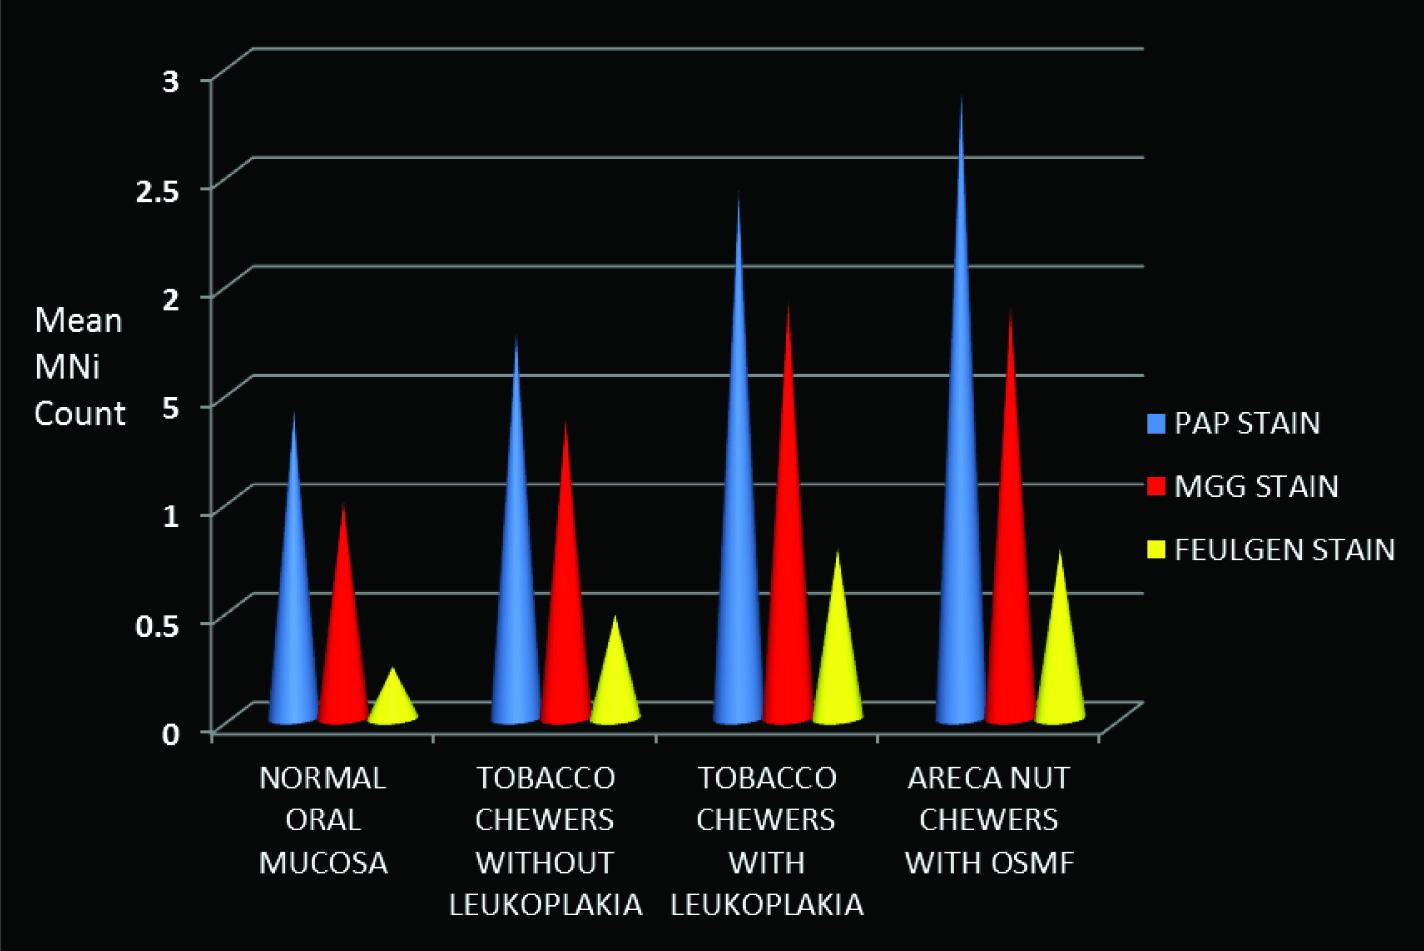 JCDR - Carcinogenic, Chromatids, Disorders, Malignant, Papanicolaou